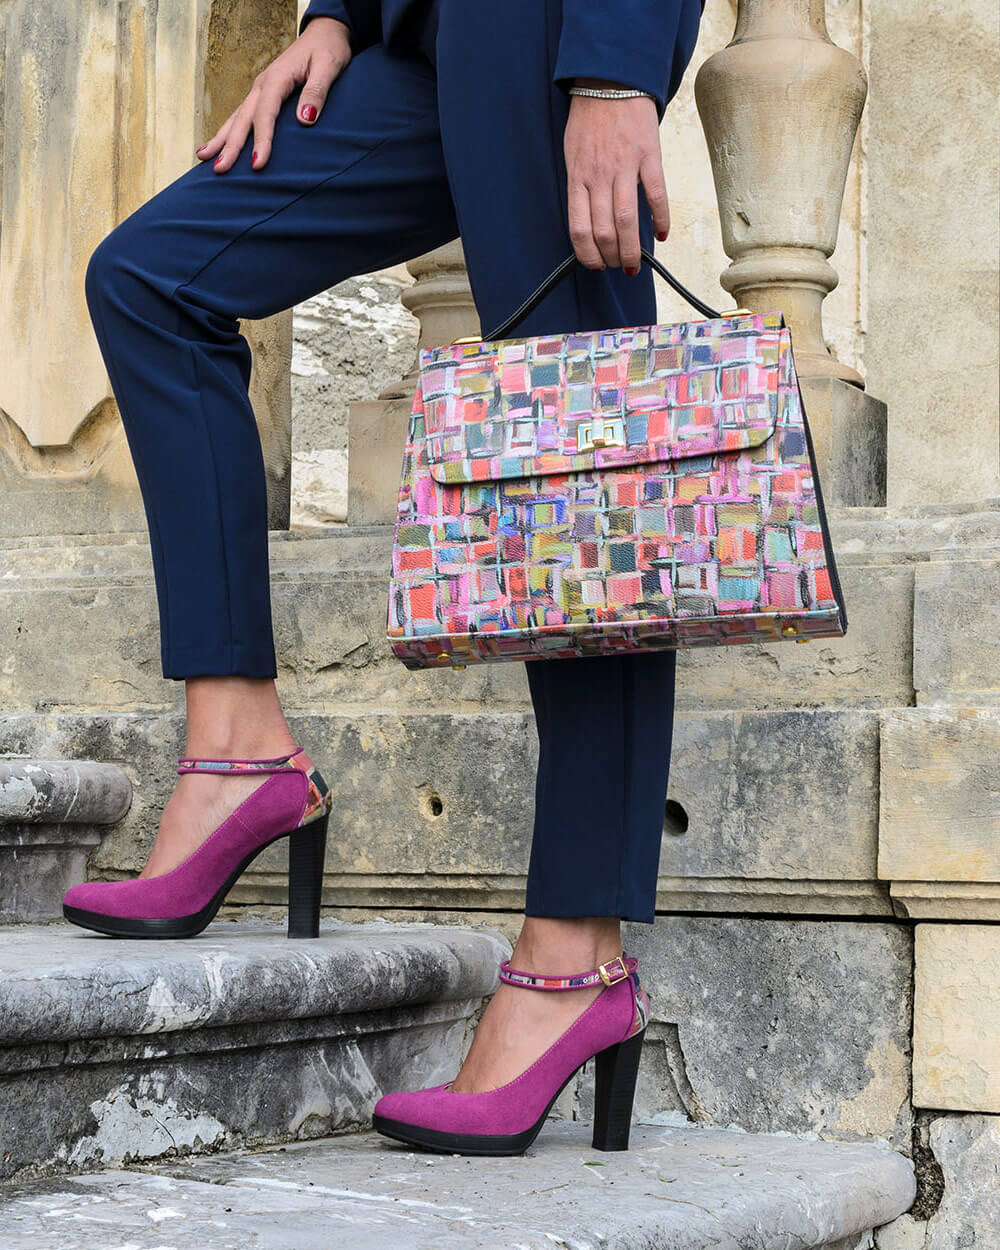 Kweder vegan designer handbags